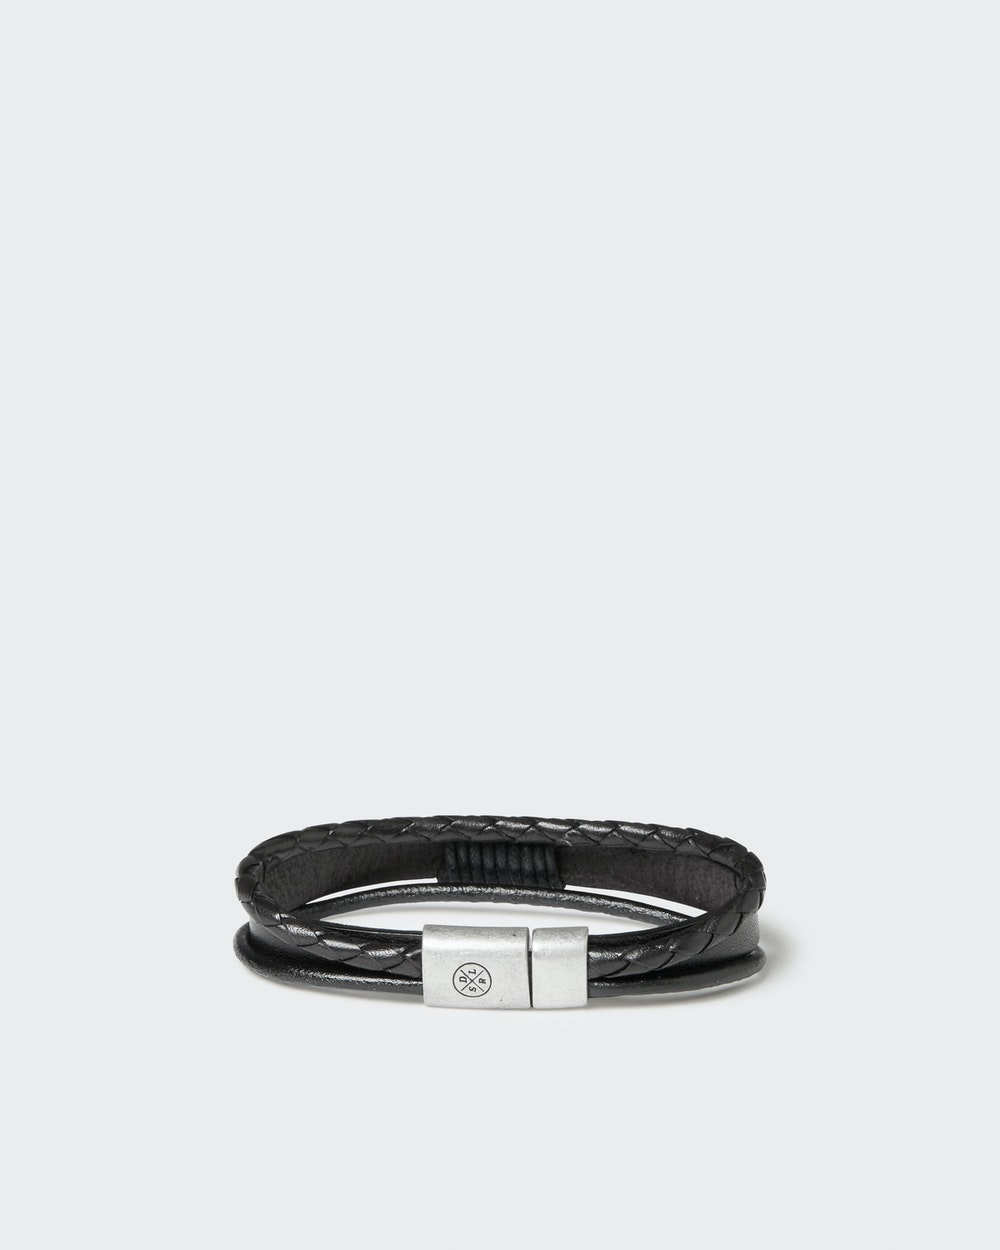 Bracelet Black Saddler